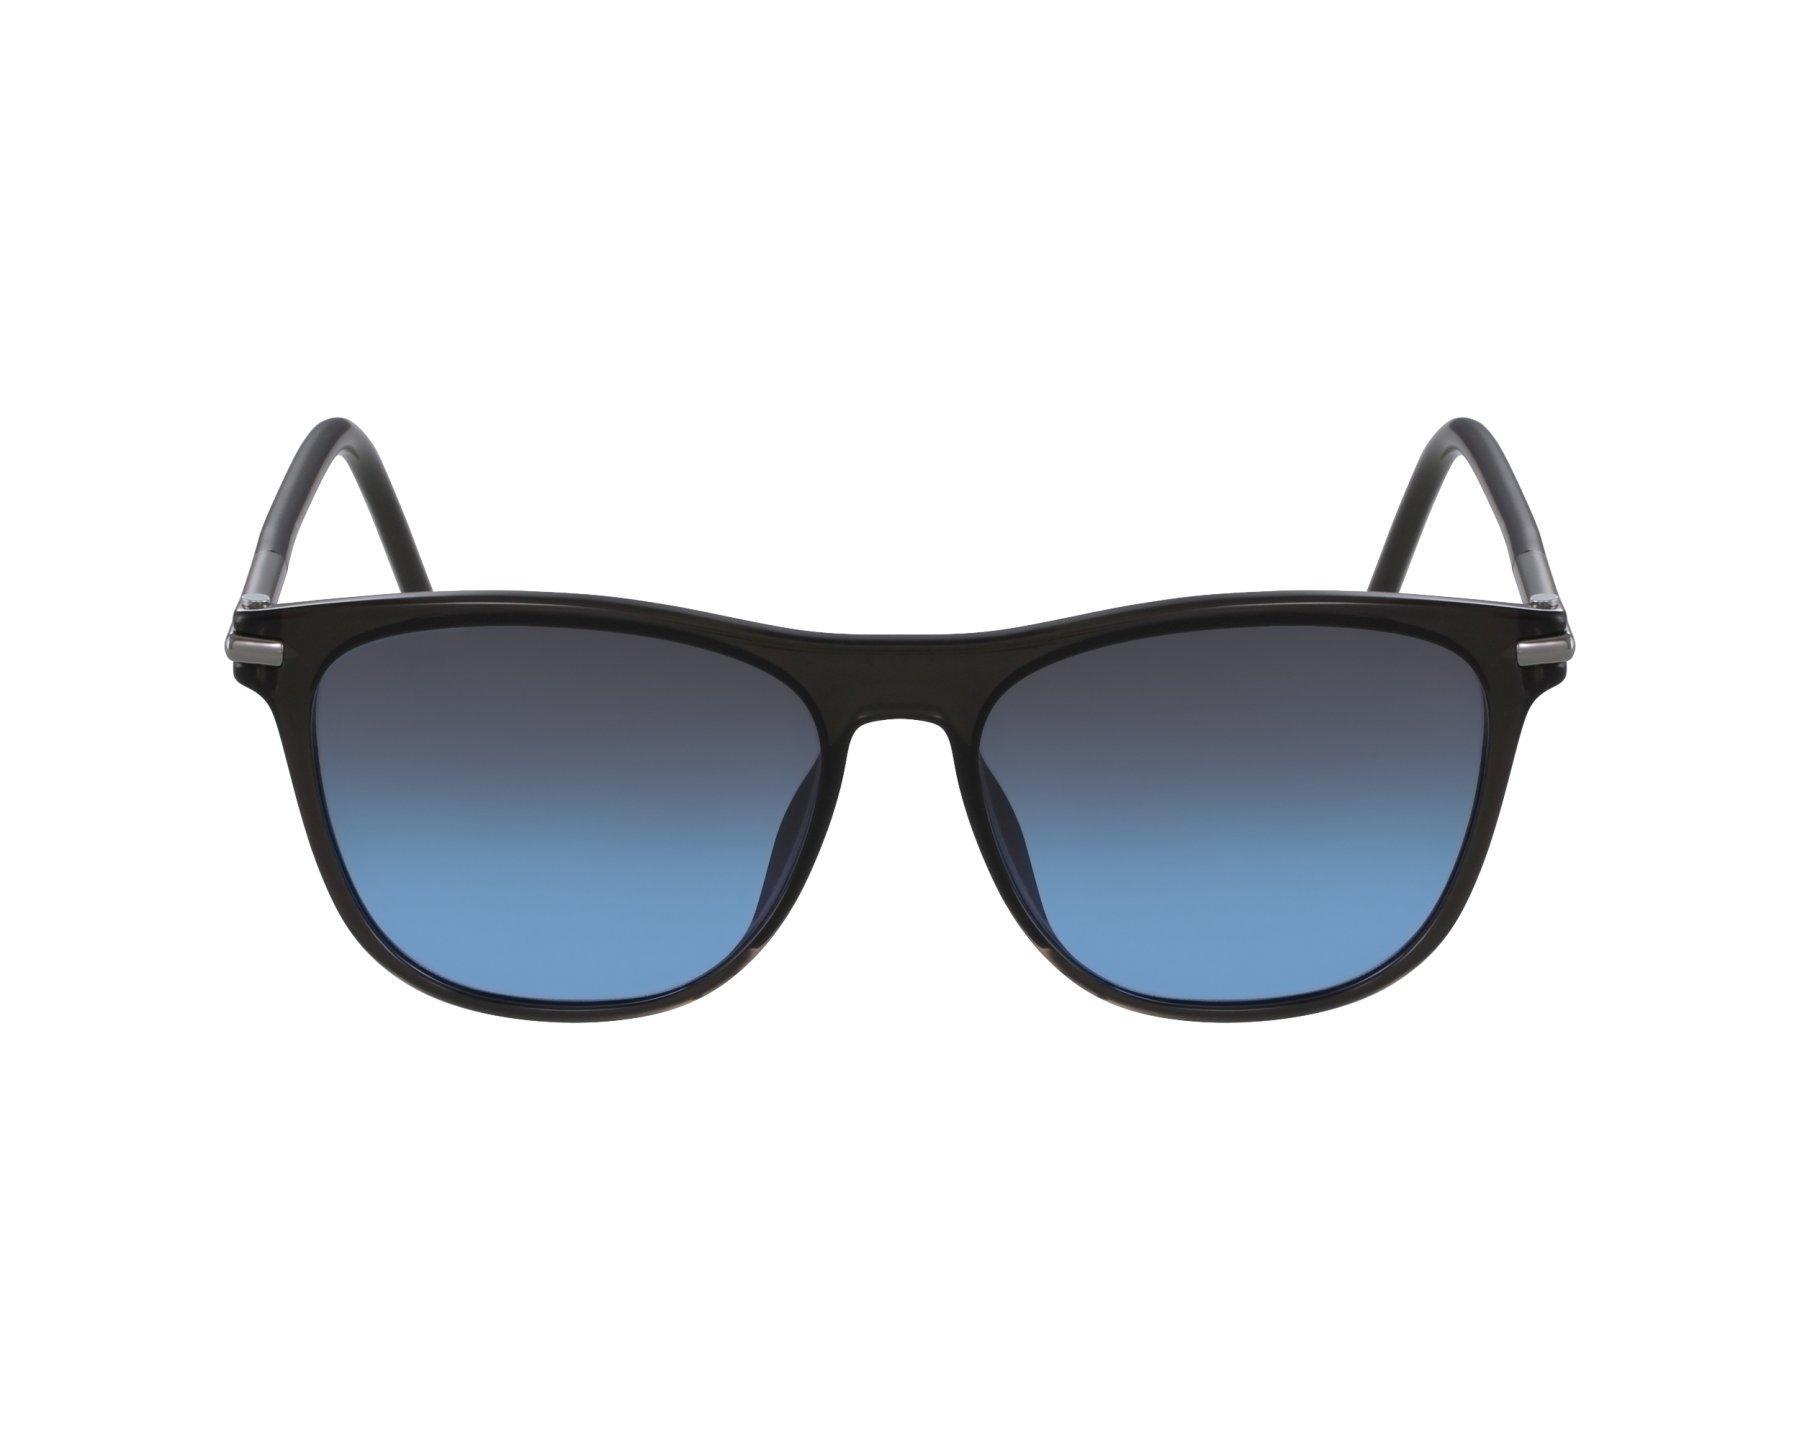 MARC JACOBS Marc Jacobs Sonnenbrille » MARC 49/S«, grau, 1VD/HL - grau/ blau